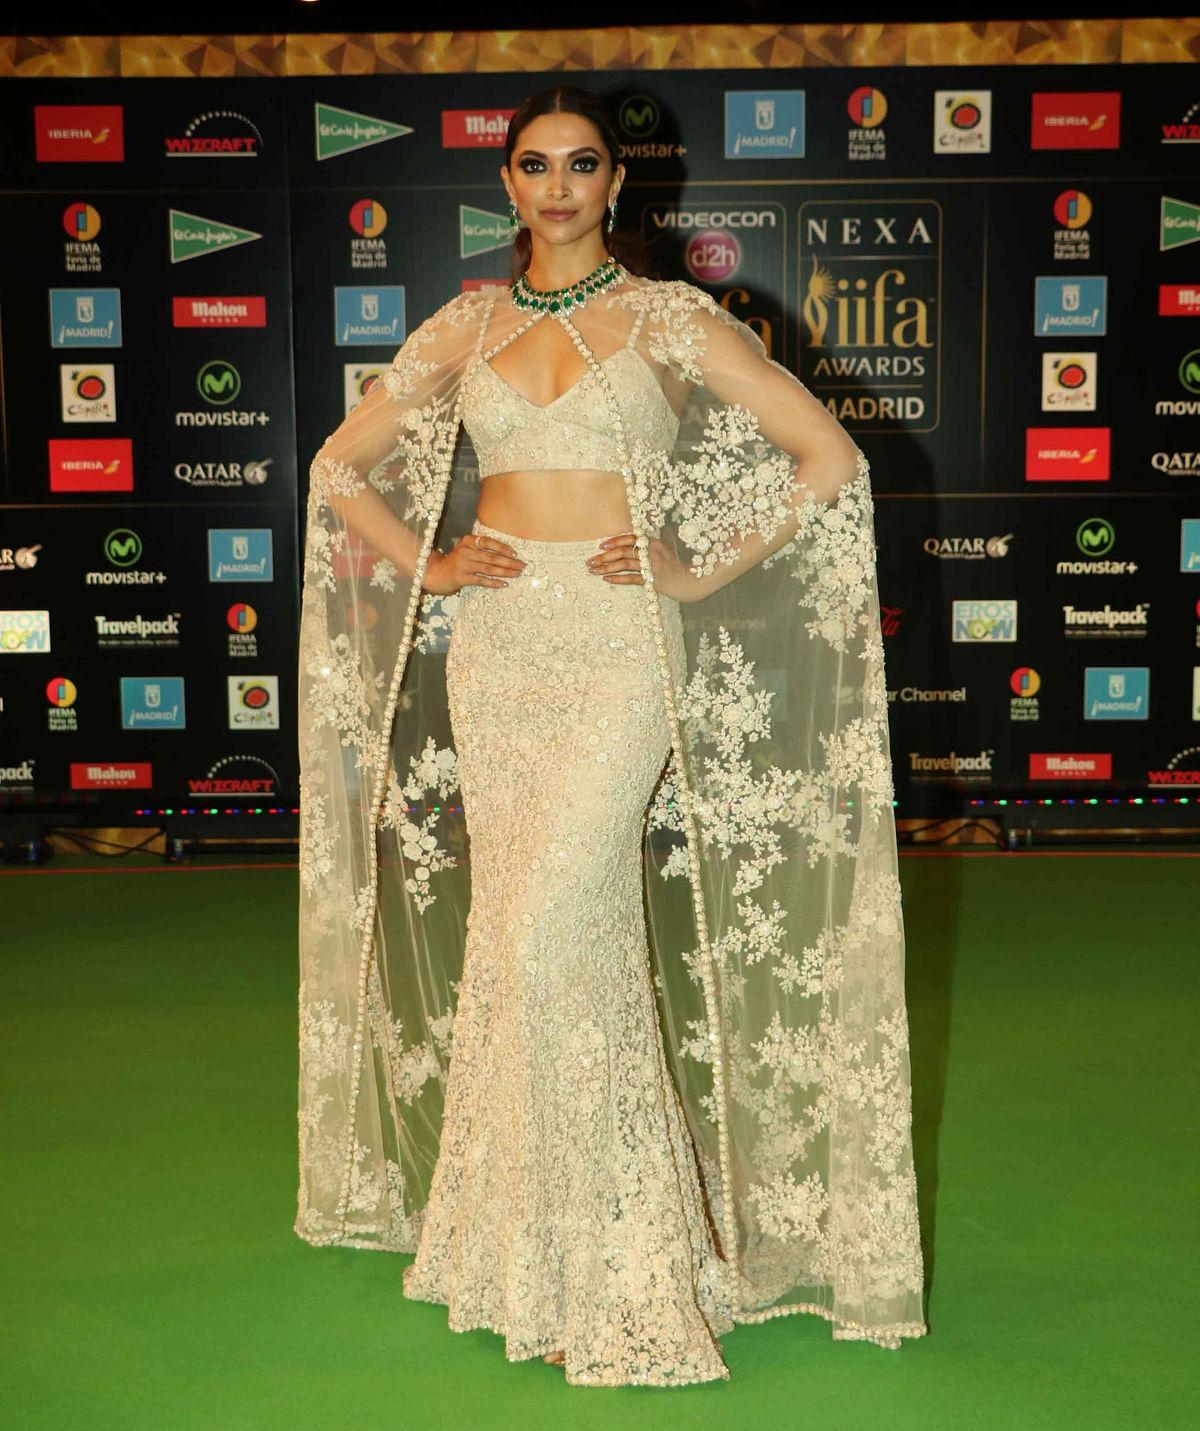 Bollywood actress Deepika Padukone poses for photographers at the International Indian Film Academy (IIFA).  (Photo: AP)